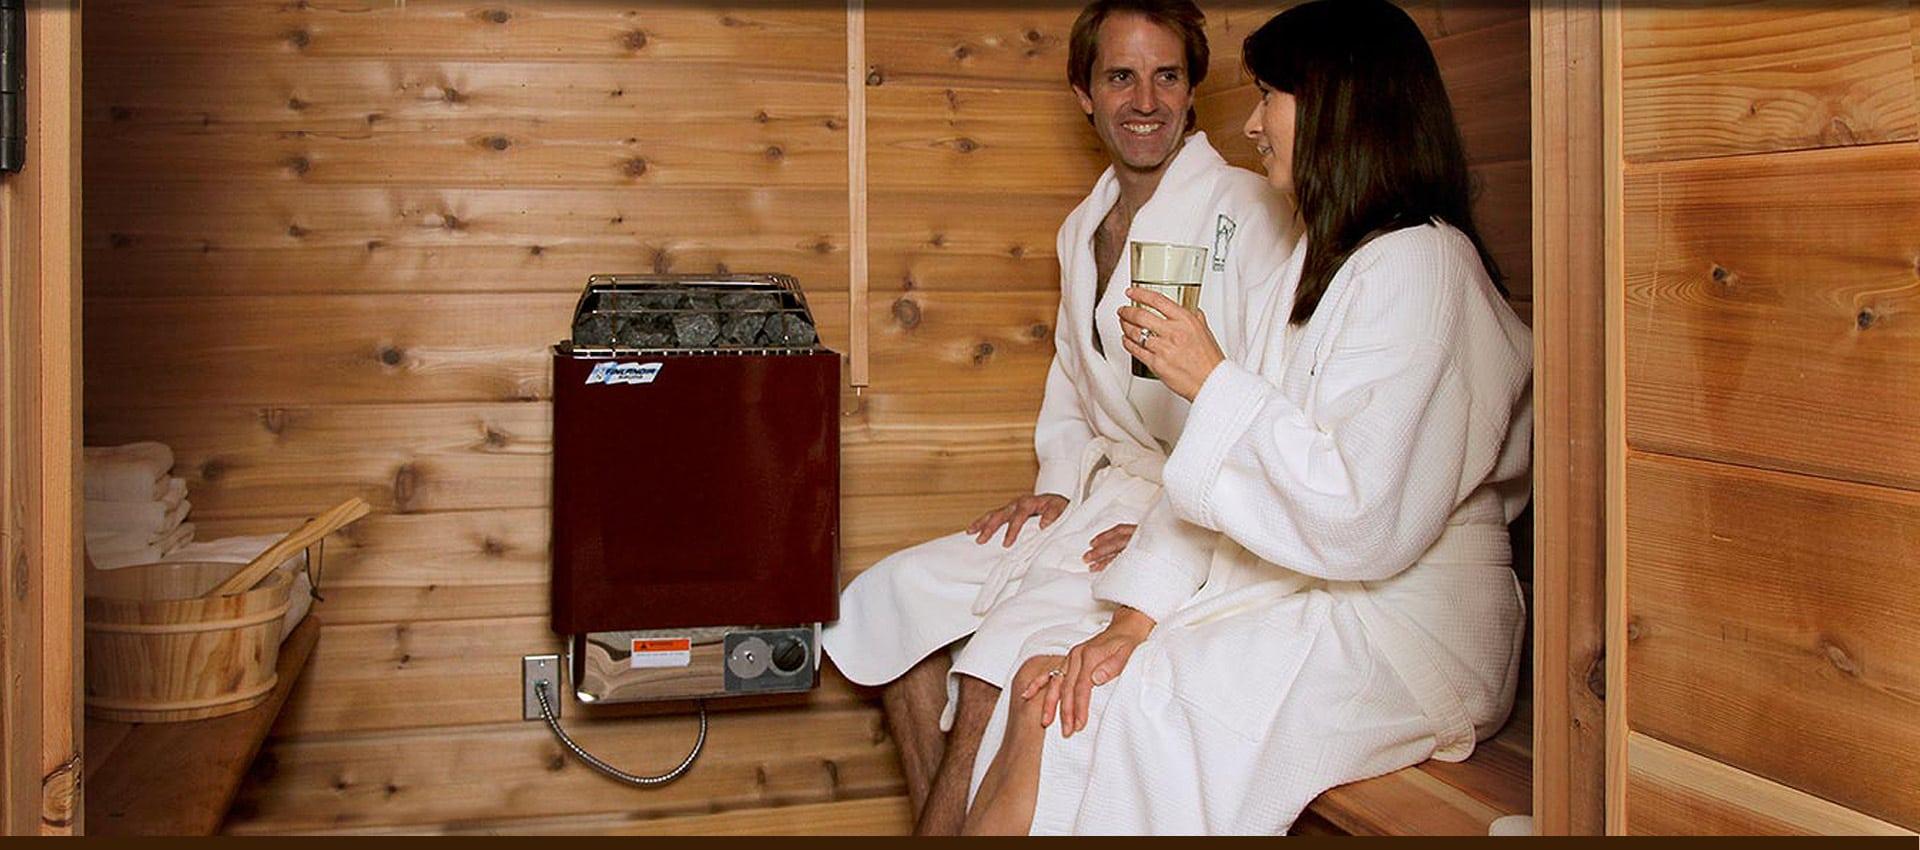 Grand-Idyllwild-sauna